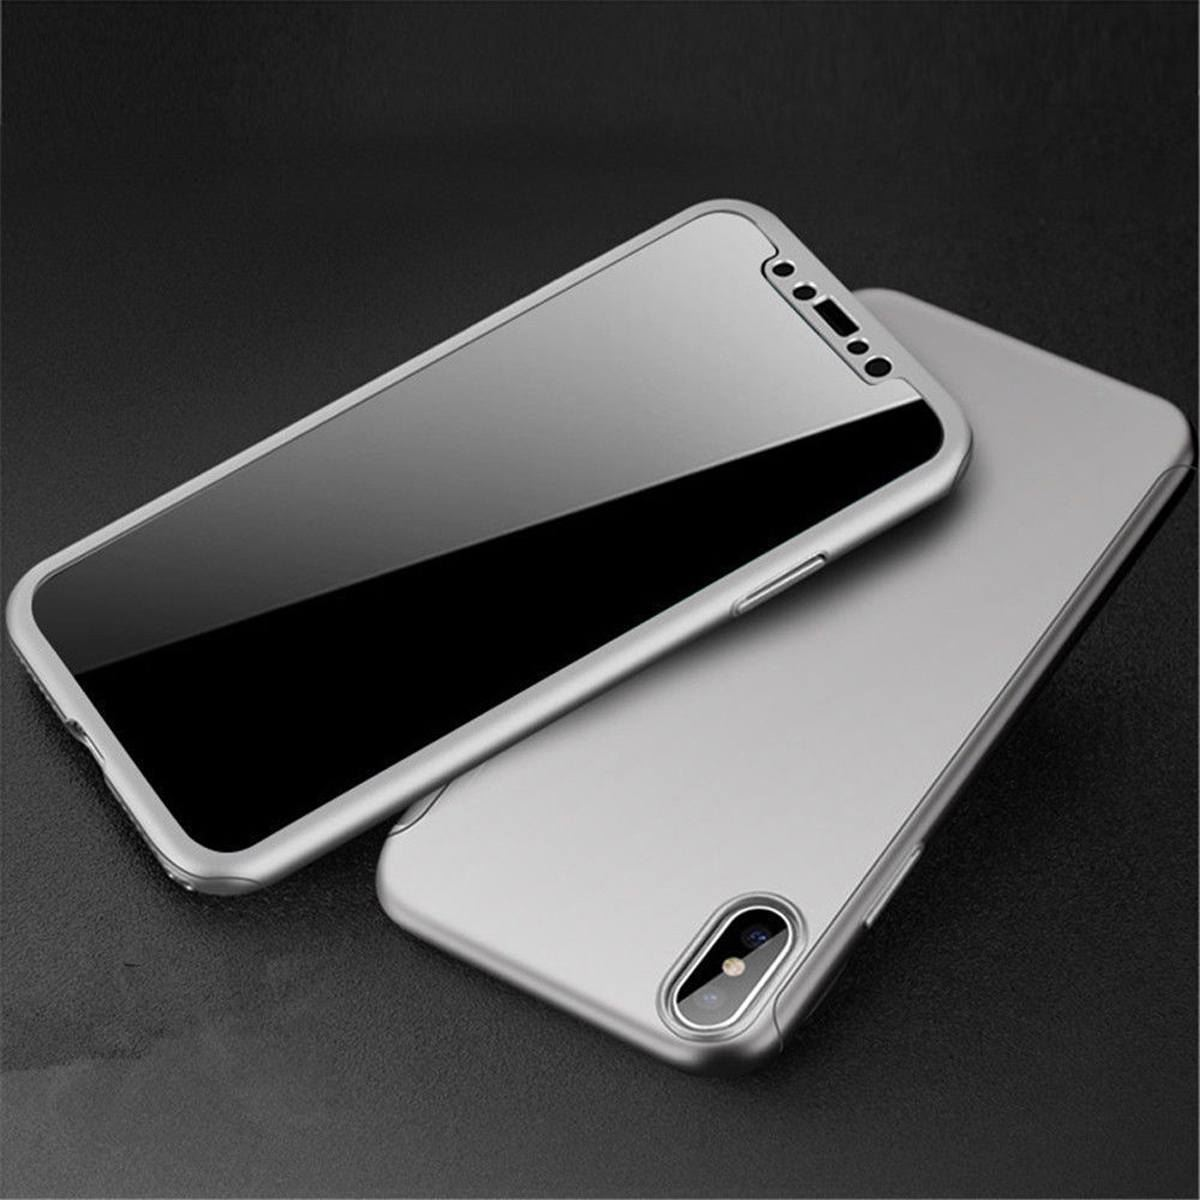 For-Apple-iPhone-XS-Max-XR-Hybrid-360-Slim-Ultra-Thin-Heavy-Duty-Shockproof-Case Indexbild 93